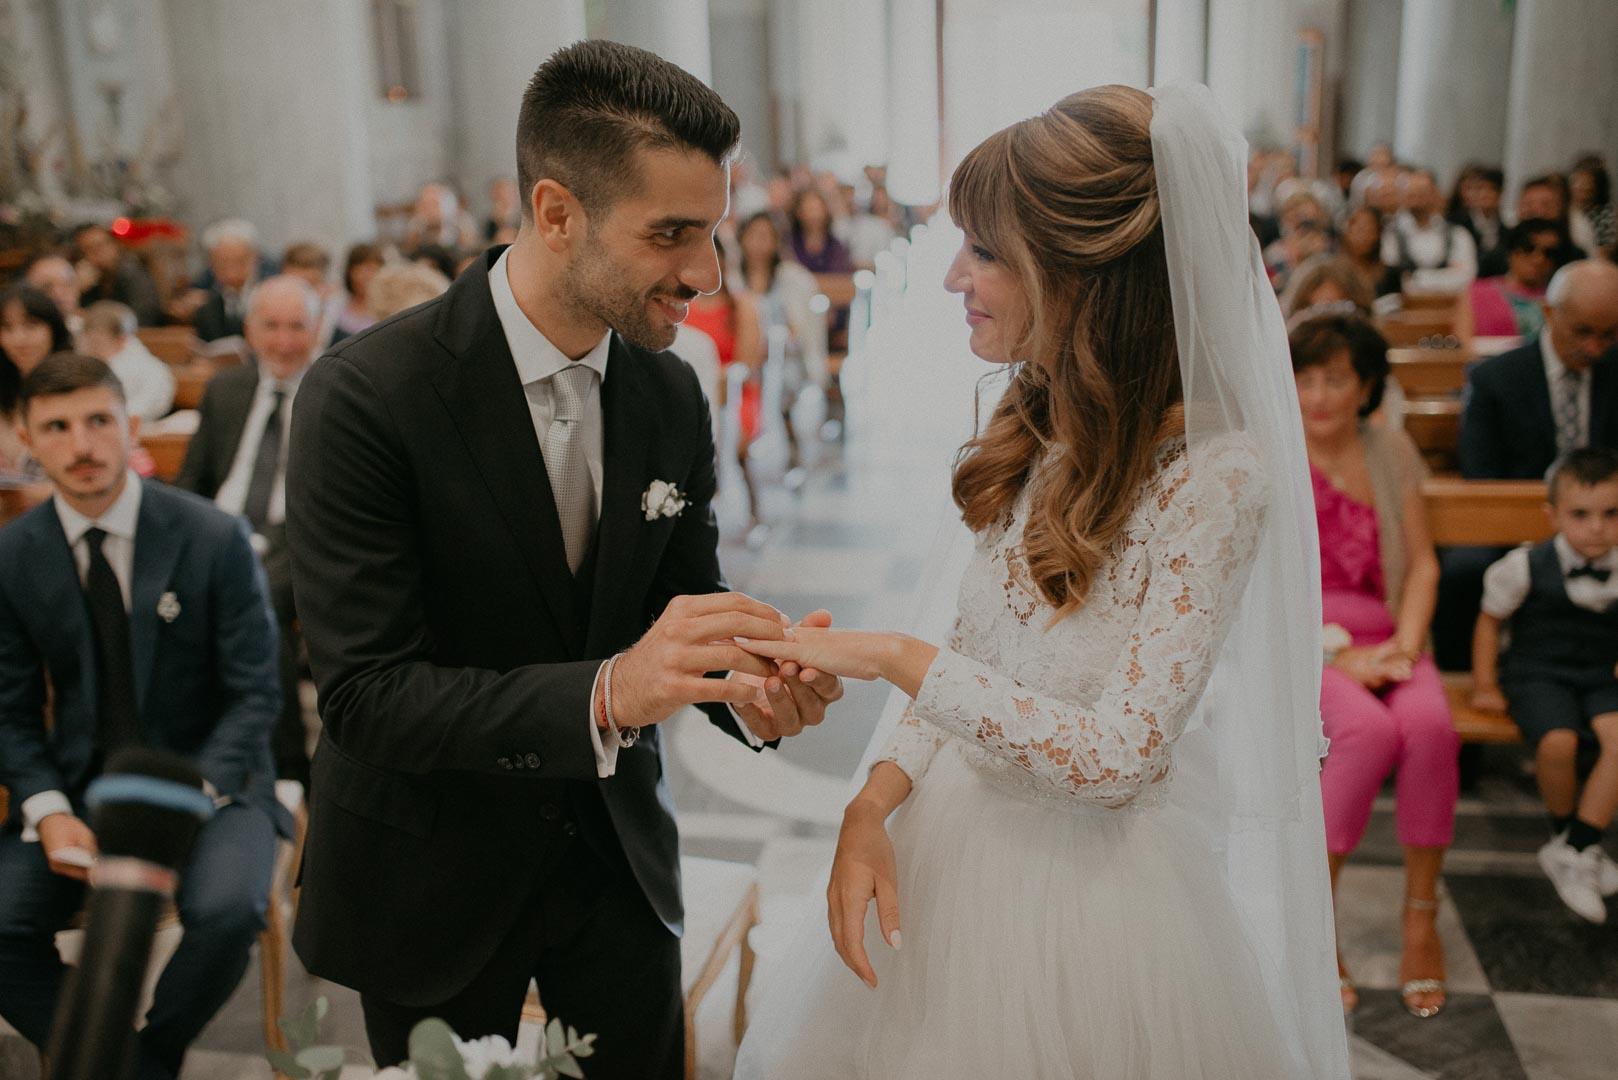 wedding-photographer-destination-fineart-bespoke-reportage-napoli-nabilah-vivianeizzo-spazio46-67